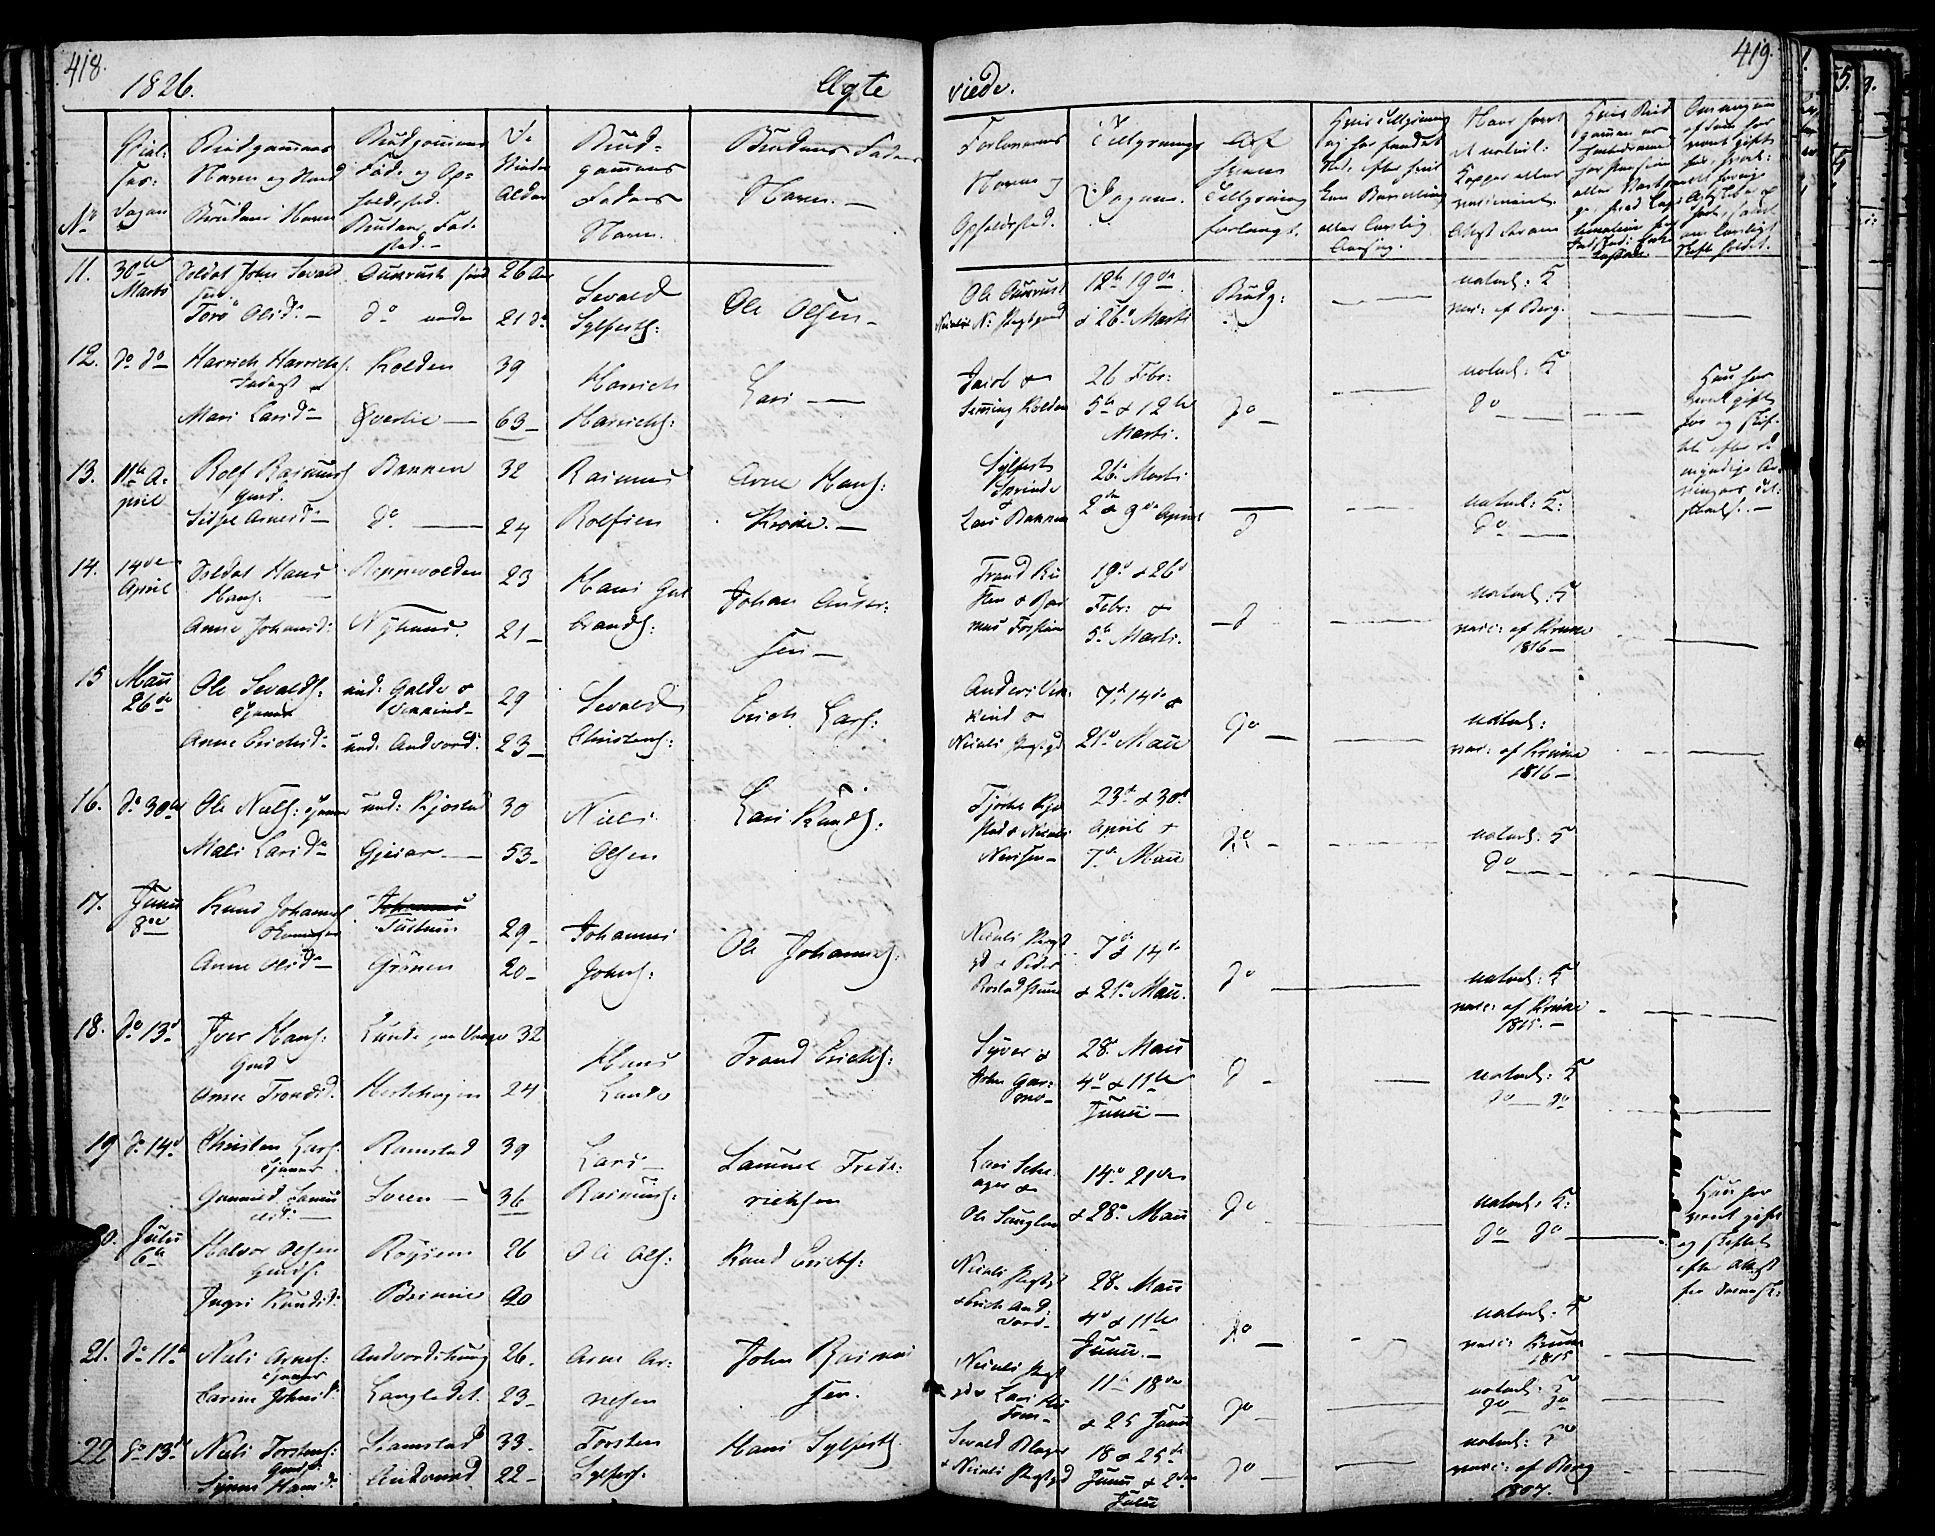 SAH, Lom prestekontor, K/L0005: Parish register (official) no. 5, 1825-1837, p. 418-419